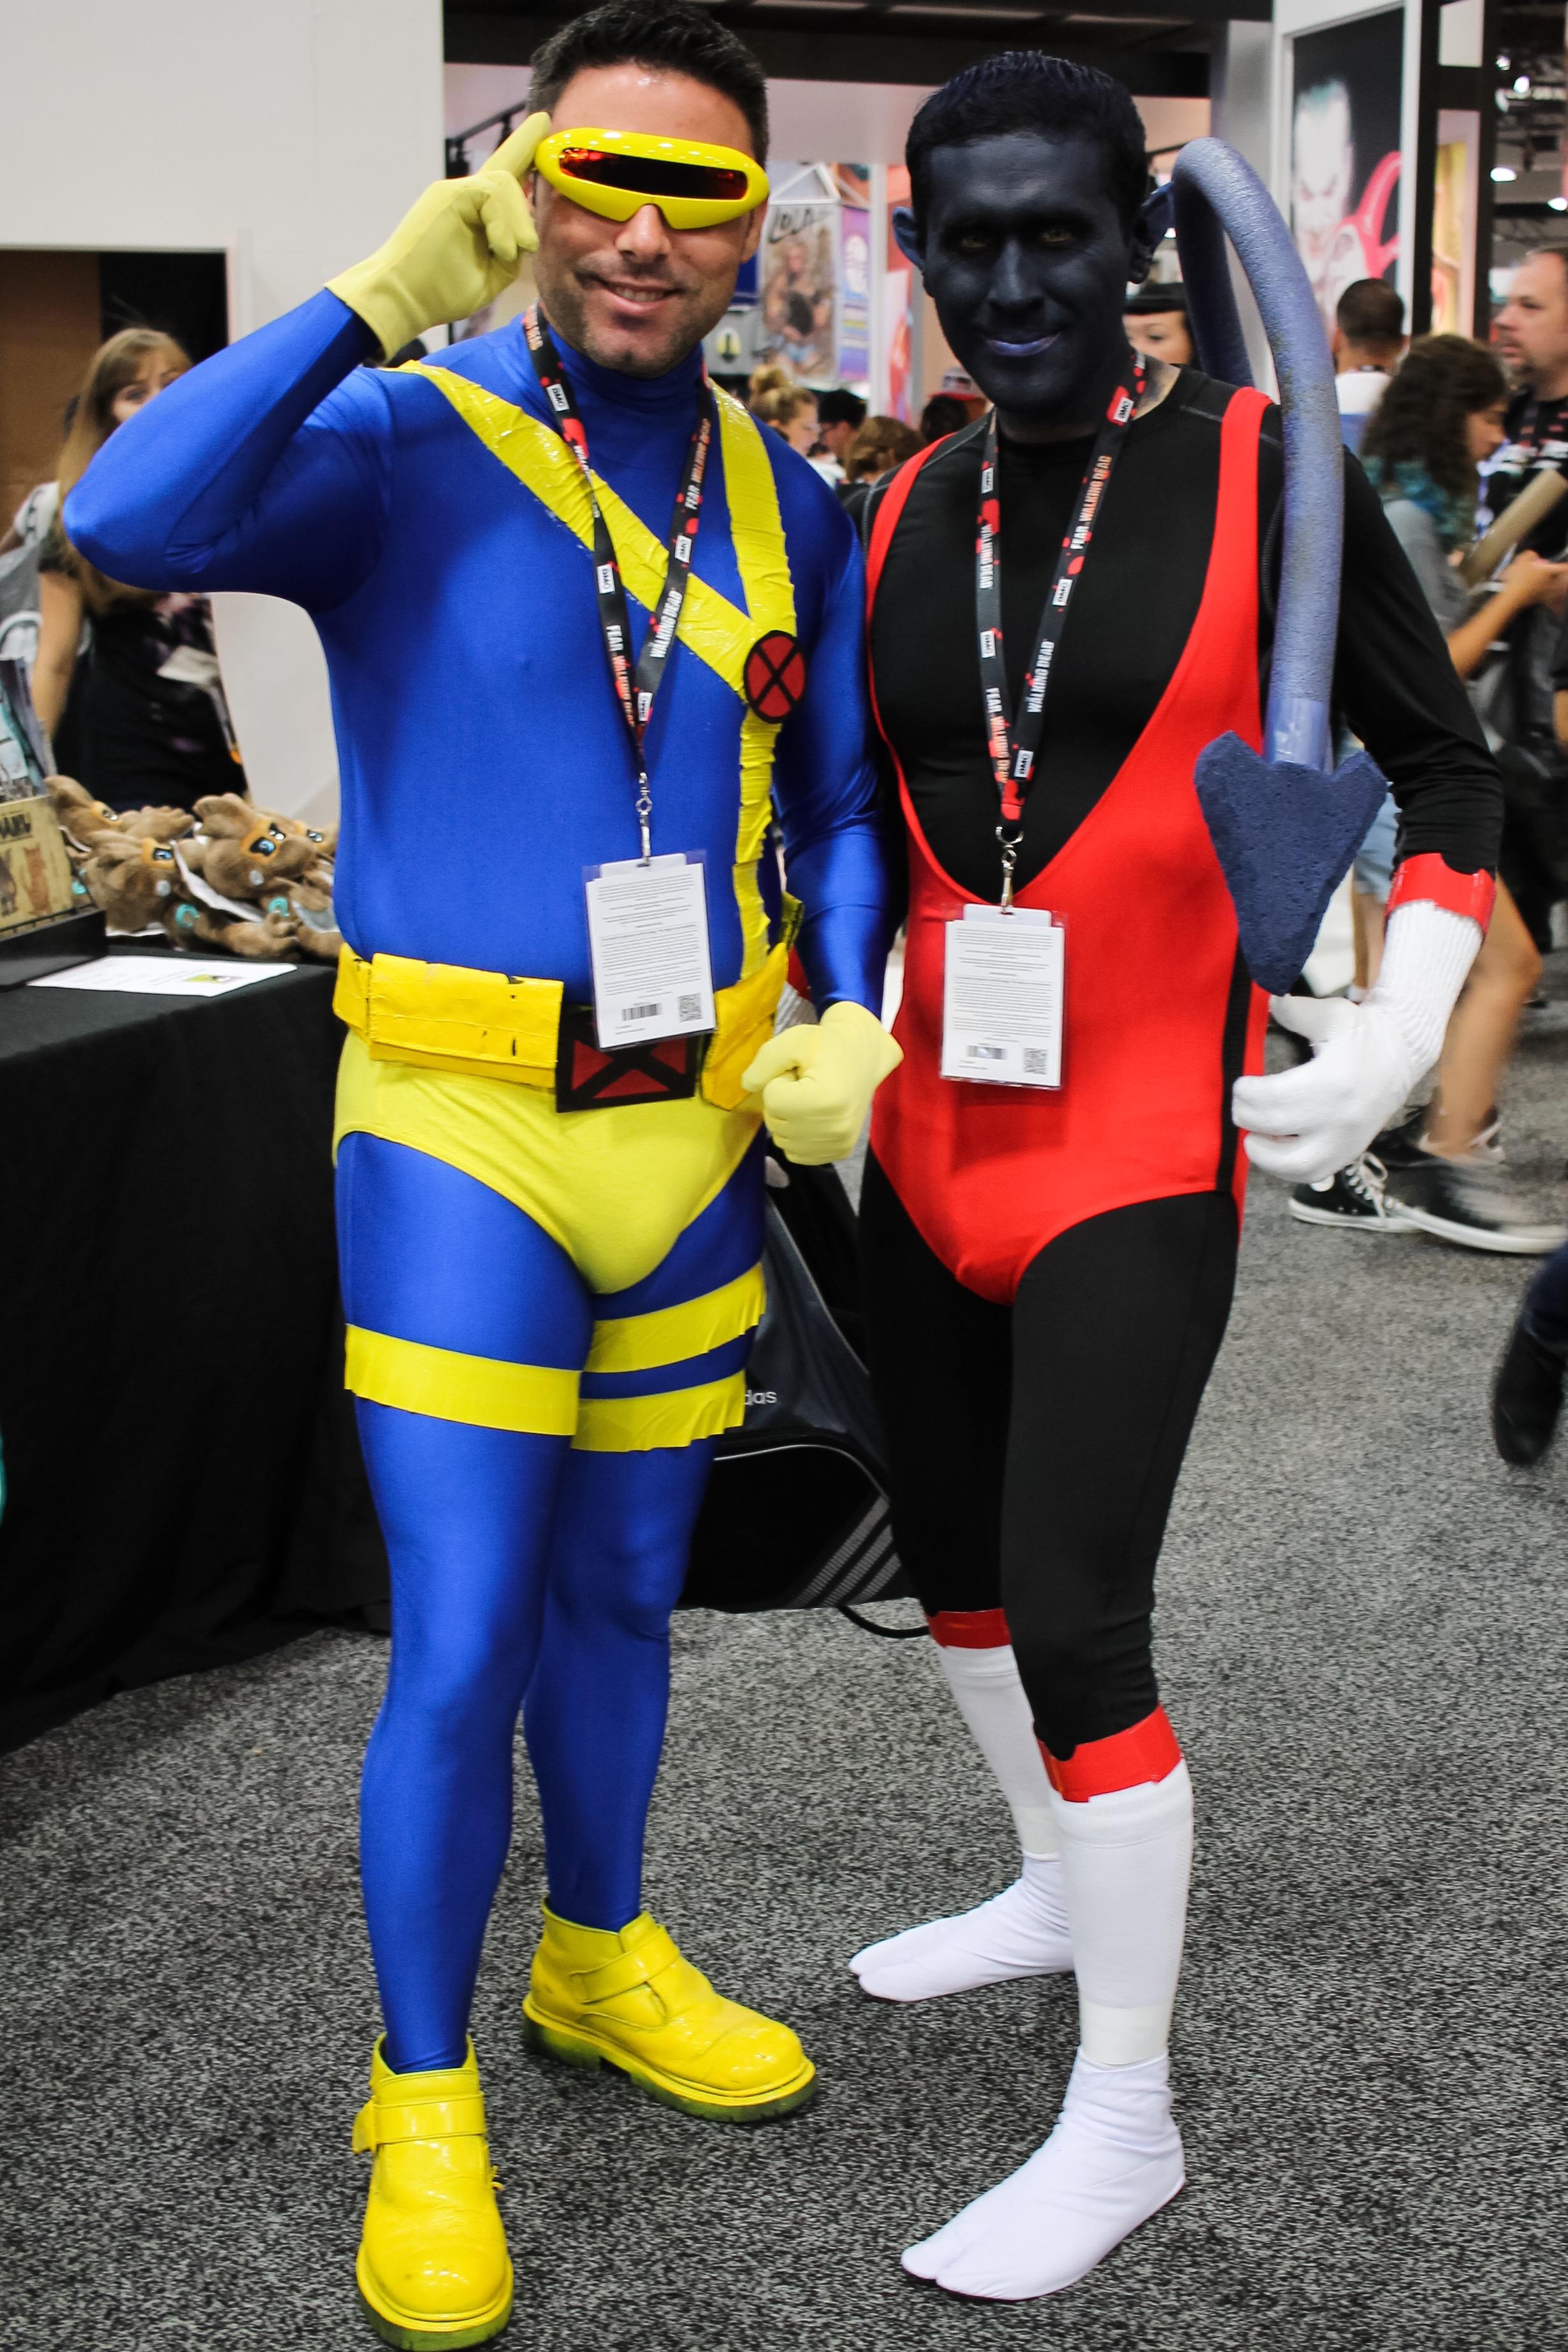 Cyclops and Nightcrawler